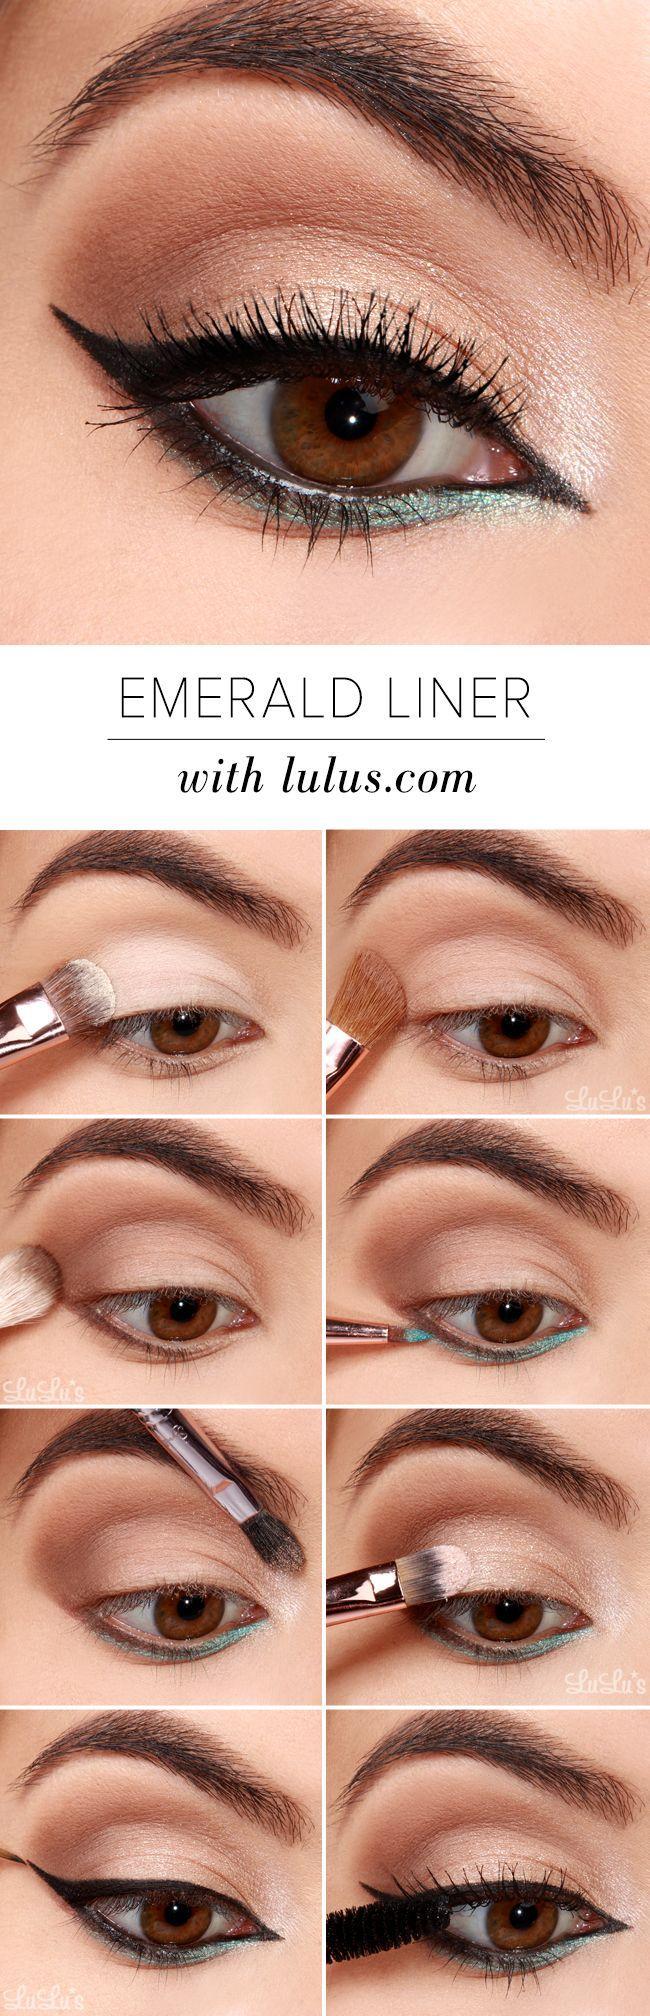 Свадьба - LuLu*s How-To: Emerald Green Eyeliner Tutorial (Lulus.com Fashion Blog)